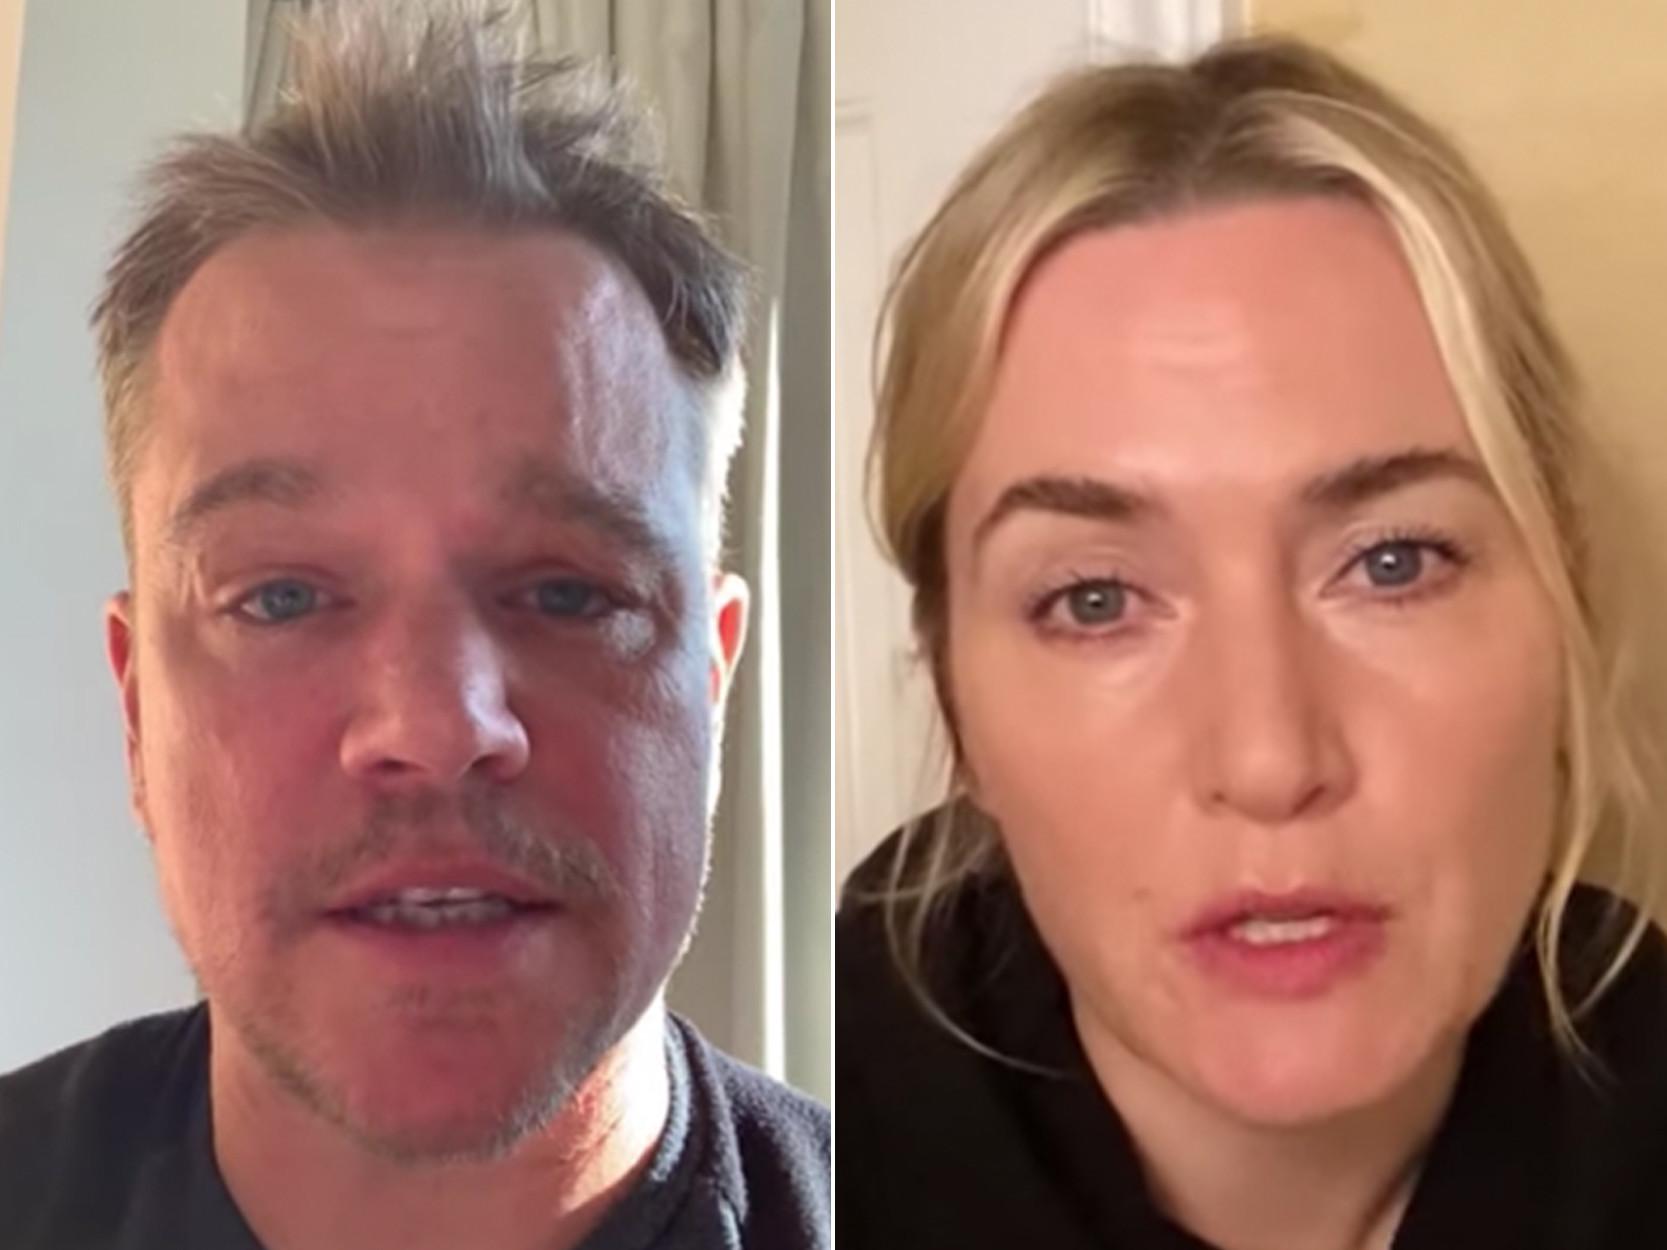 Stars of 'Contagion' reunite for coronavirus advice videos